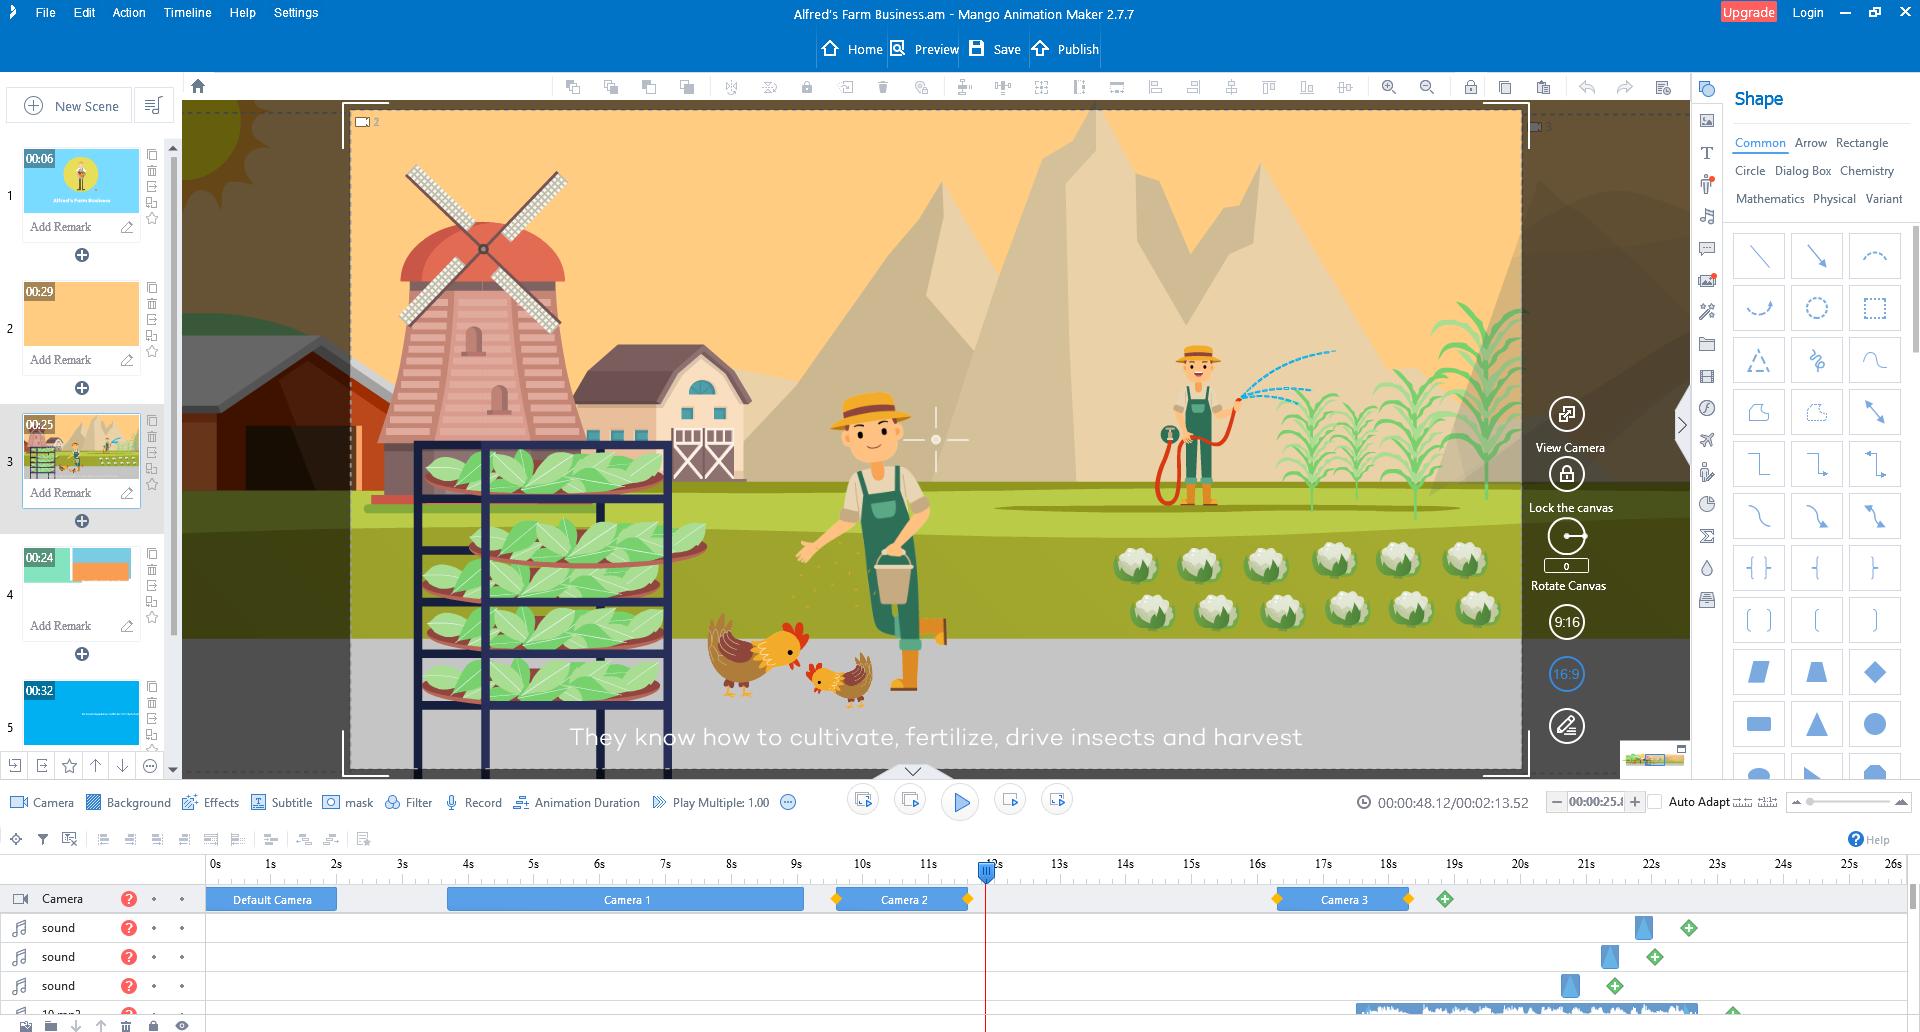 Mango Animate Animation Maker Lifetime, Video Editing Software Screenshot